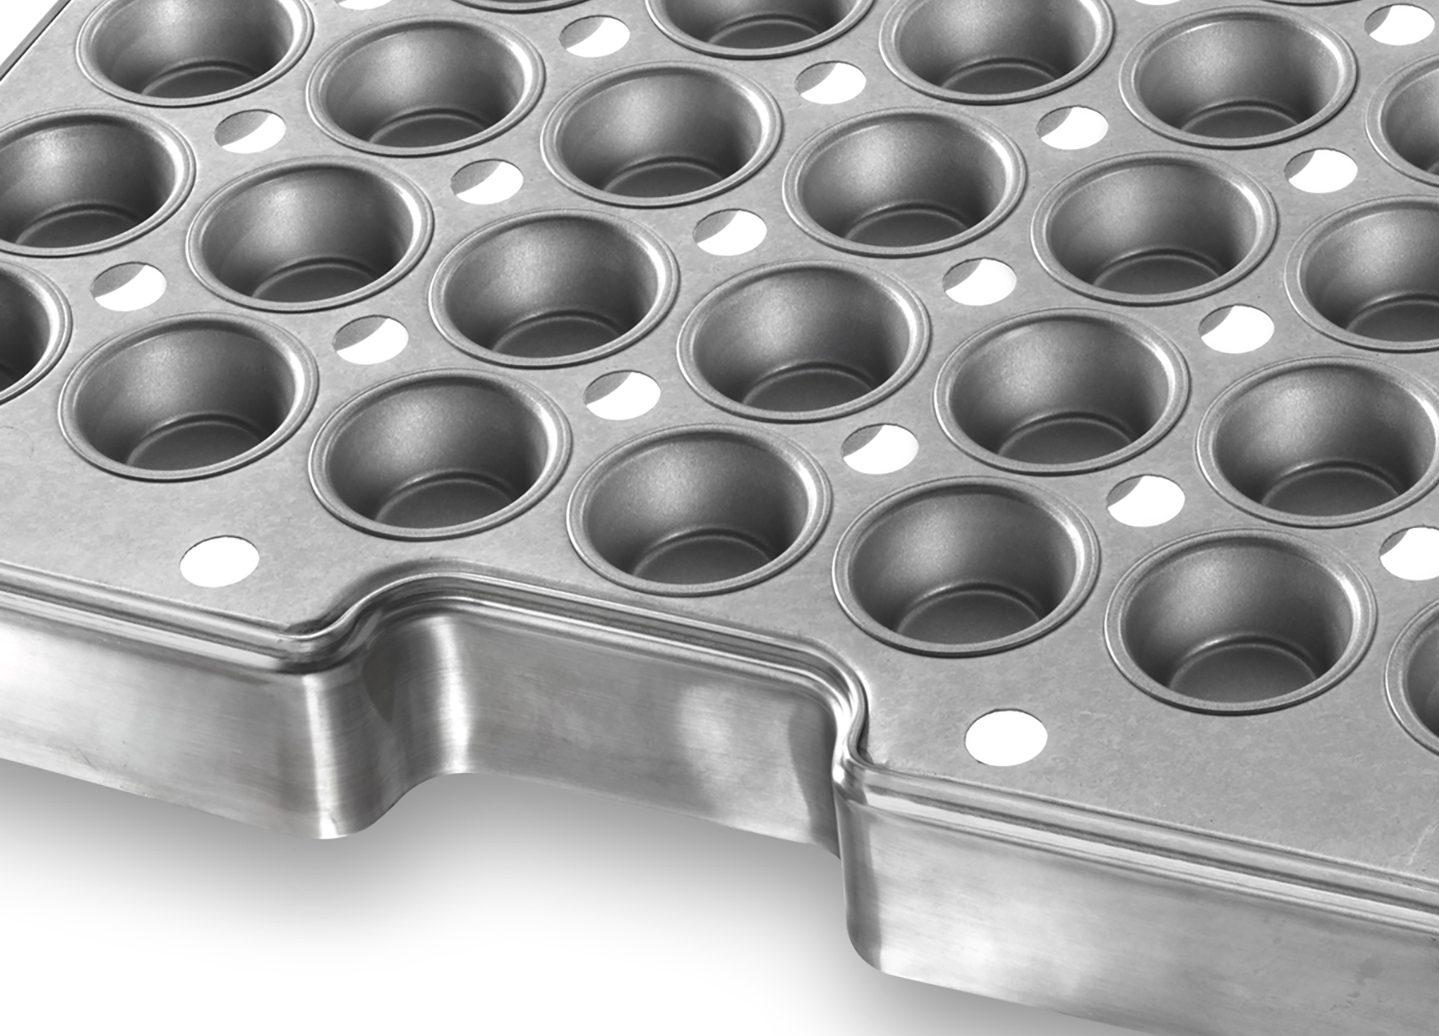 Auto-Bake Muffin ePAN with Drain Holes – AMERICOAT® Coating